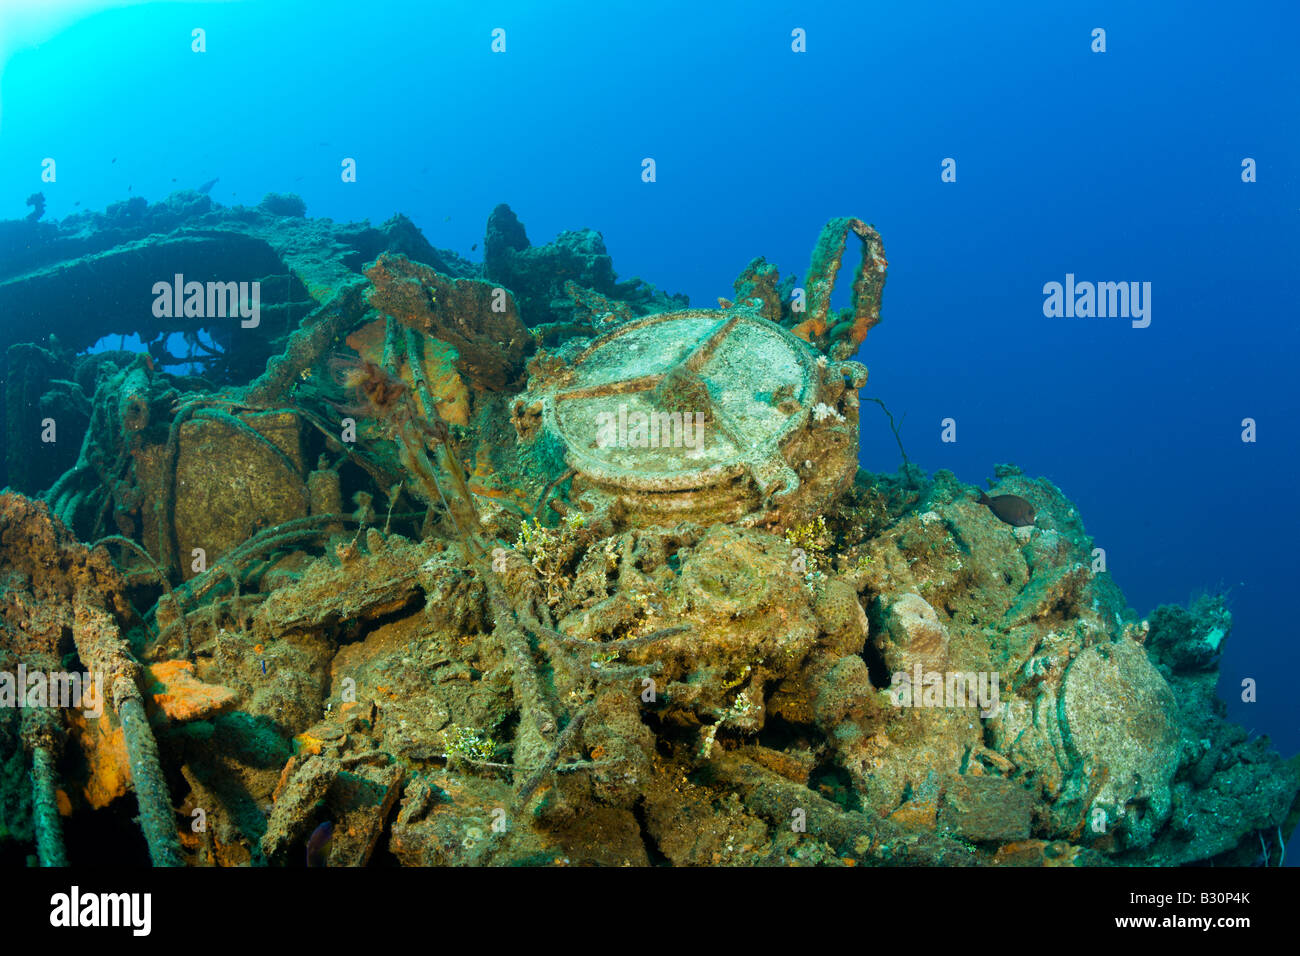 Wreckage of USS Saratoga Marshall Islands Bikini Atoll Micronesia Pacific Ocean - Stock Image